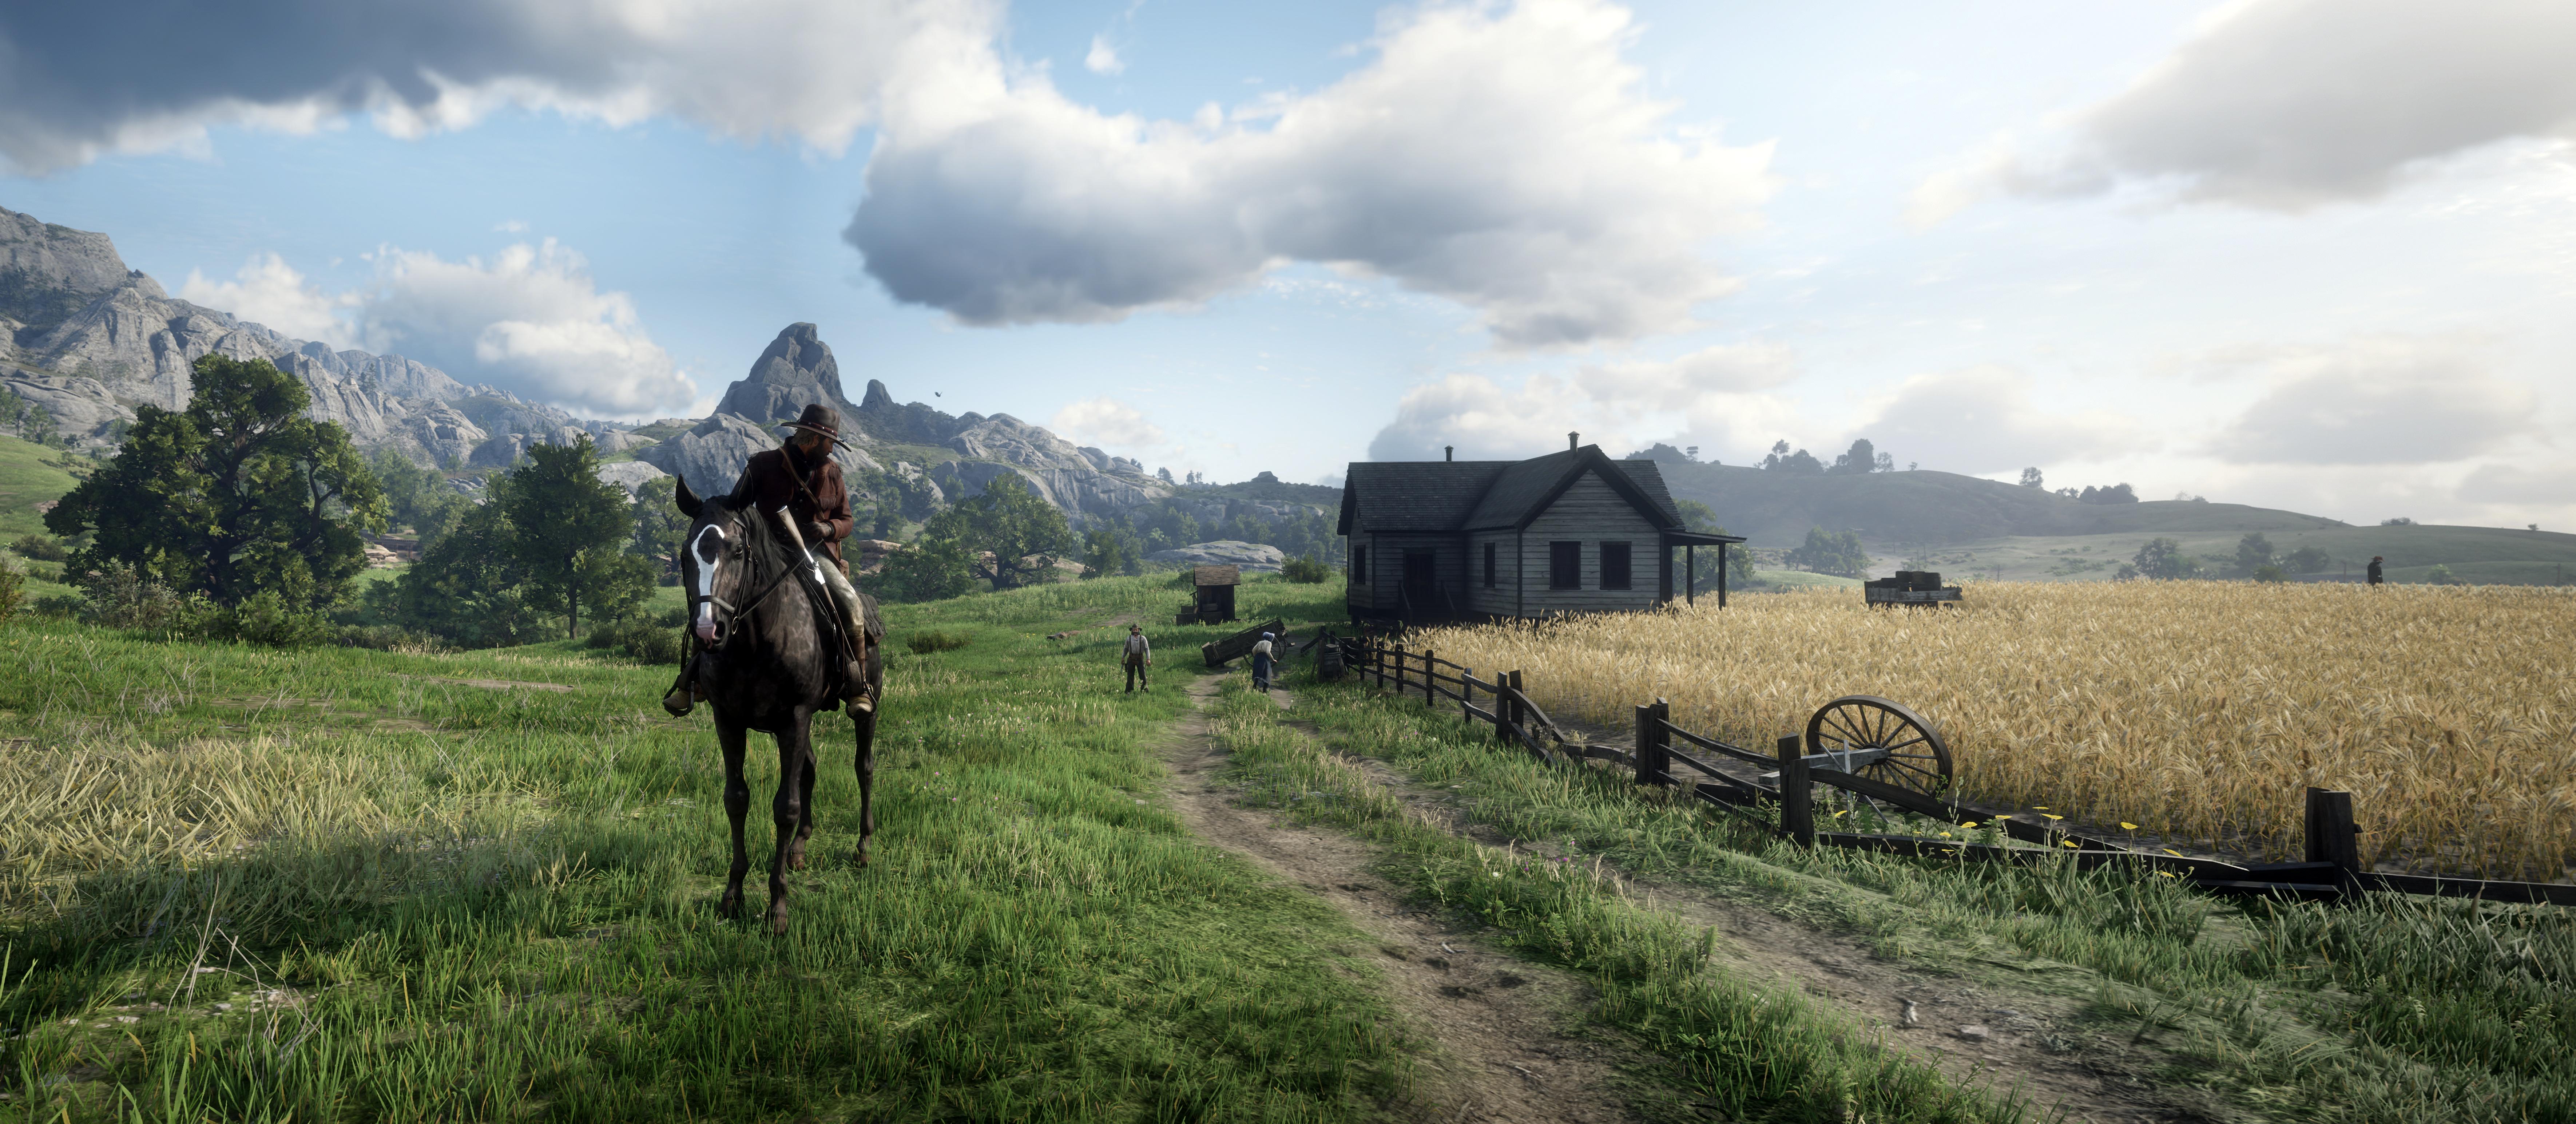 Image Red Dead Redemption 2 Horses Man Nature 3d Graphics 7079x3088